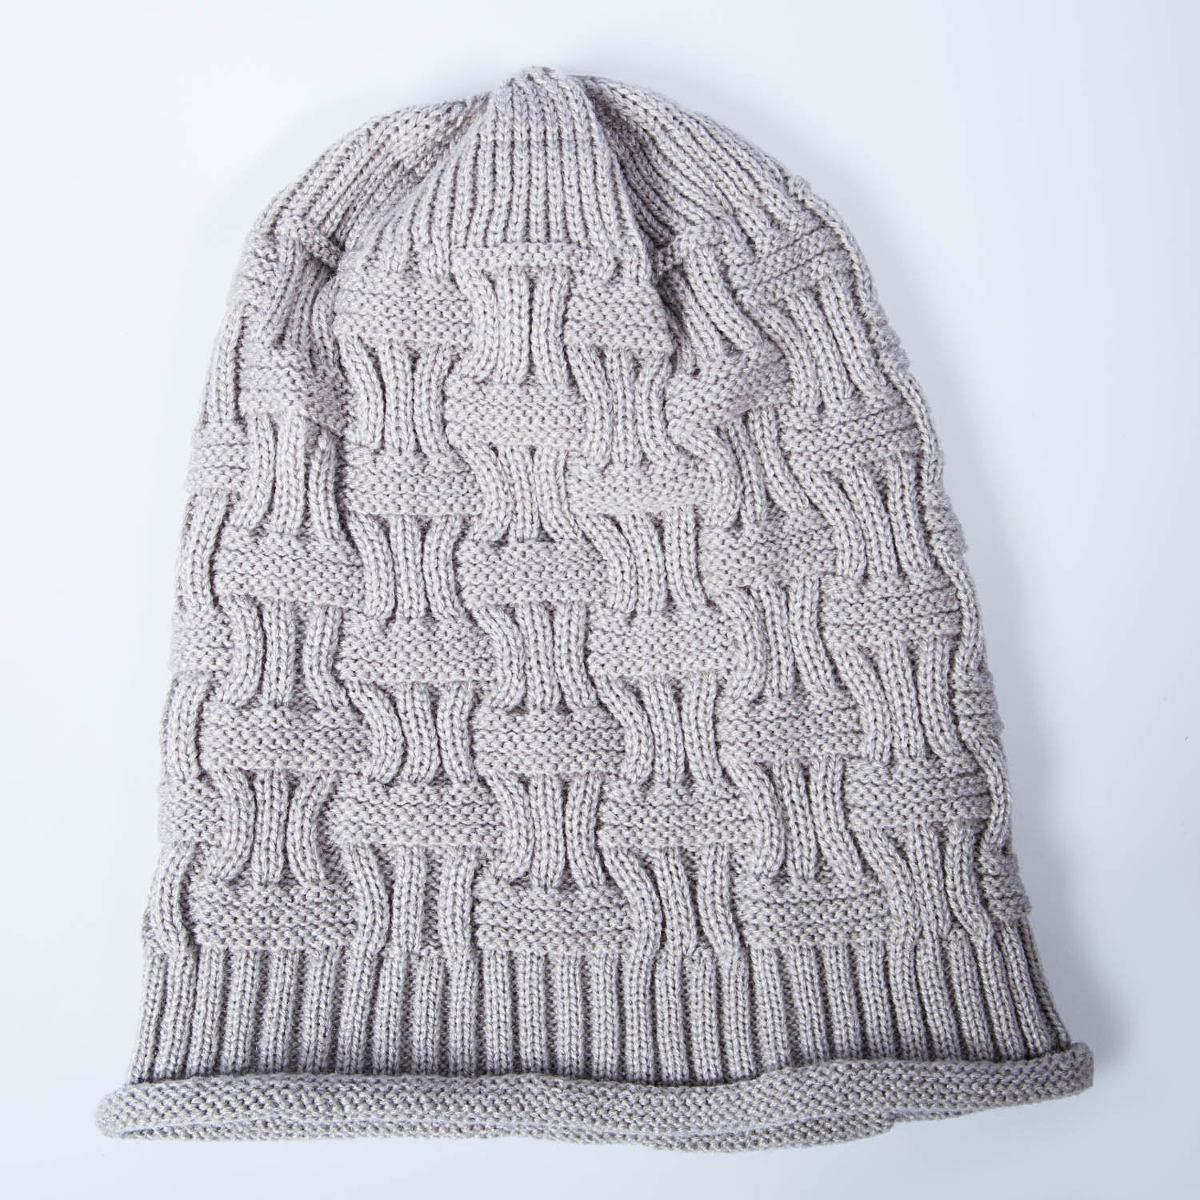 Senker Slouchy Beanie Cap Knit Soft Cozy Oversized Sombre ...